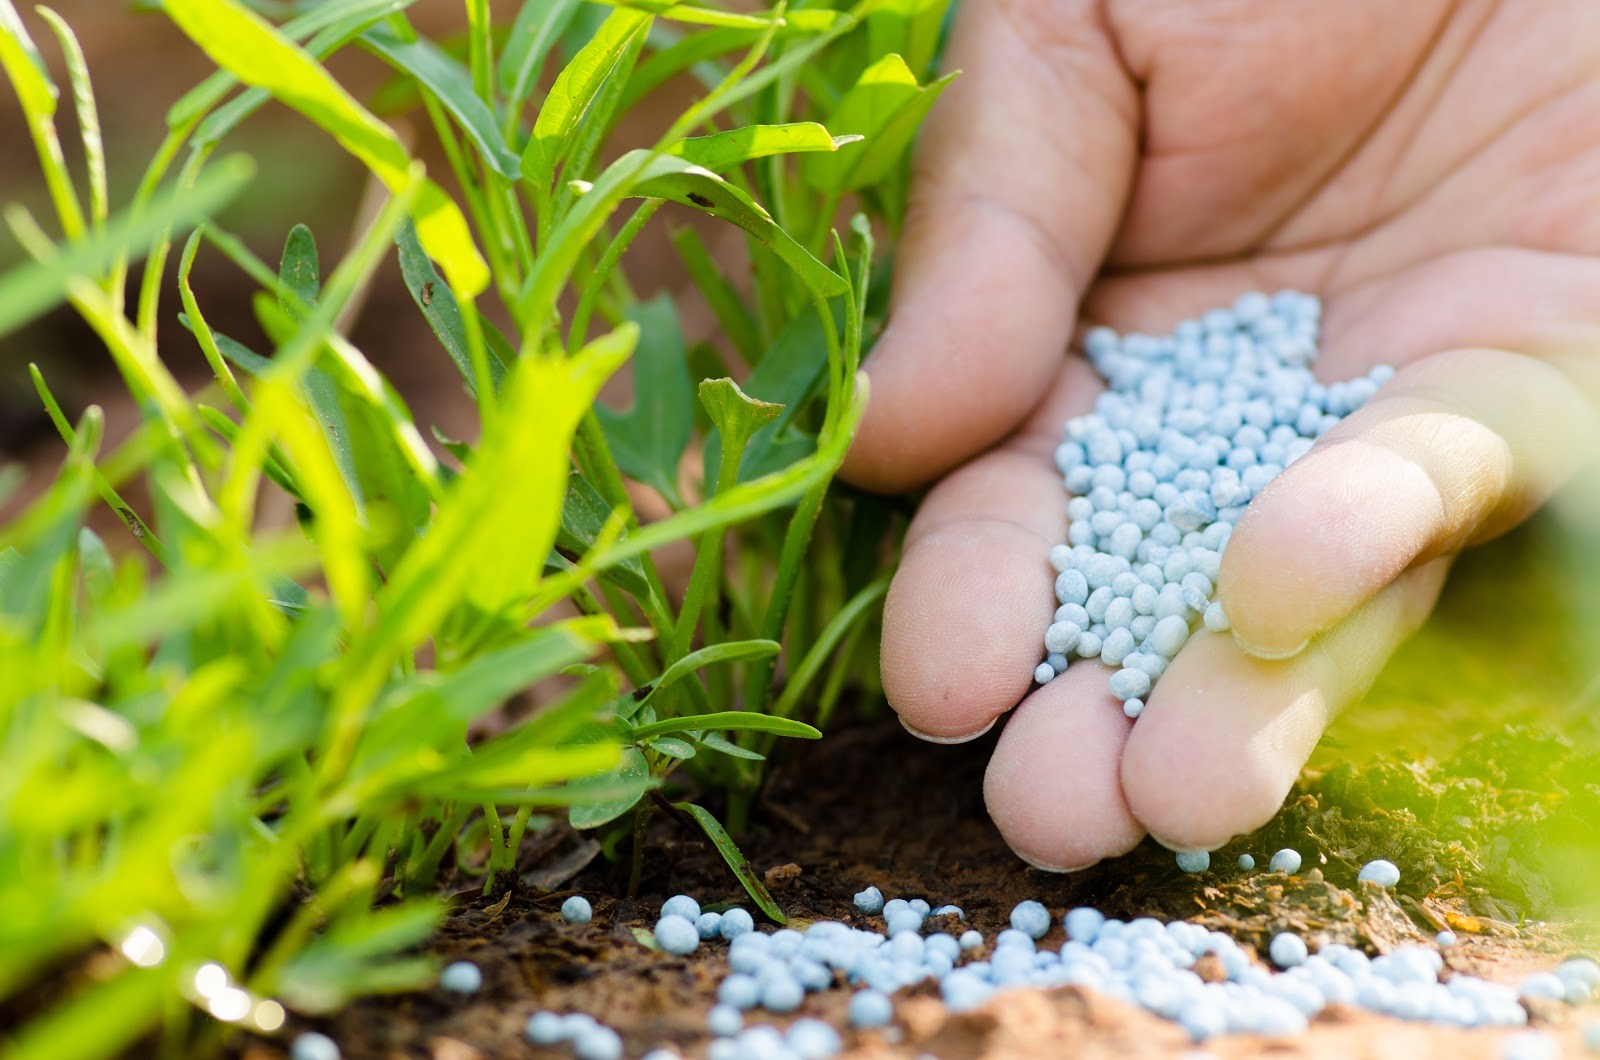 Nitrogenous Fertilizer Market Size, Share, Supply, Demand, Segments and Forecast 2019-2023